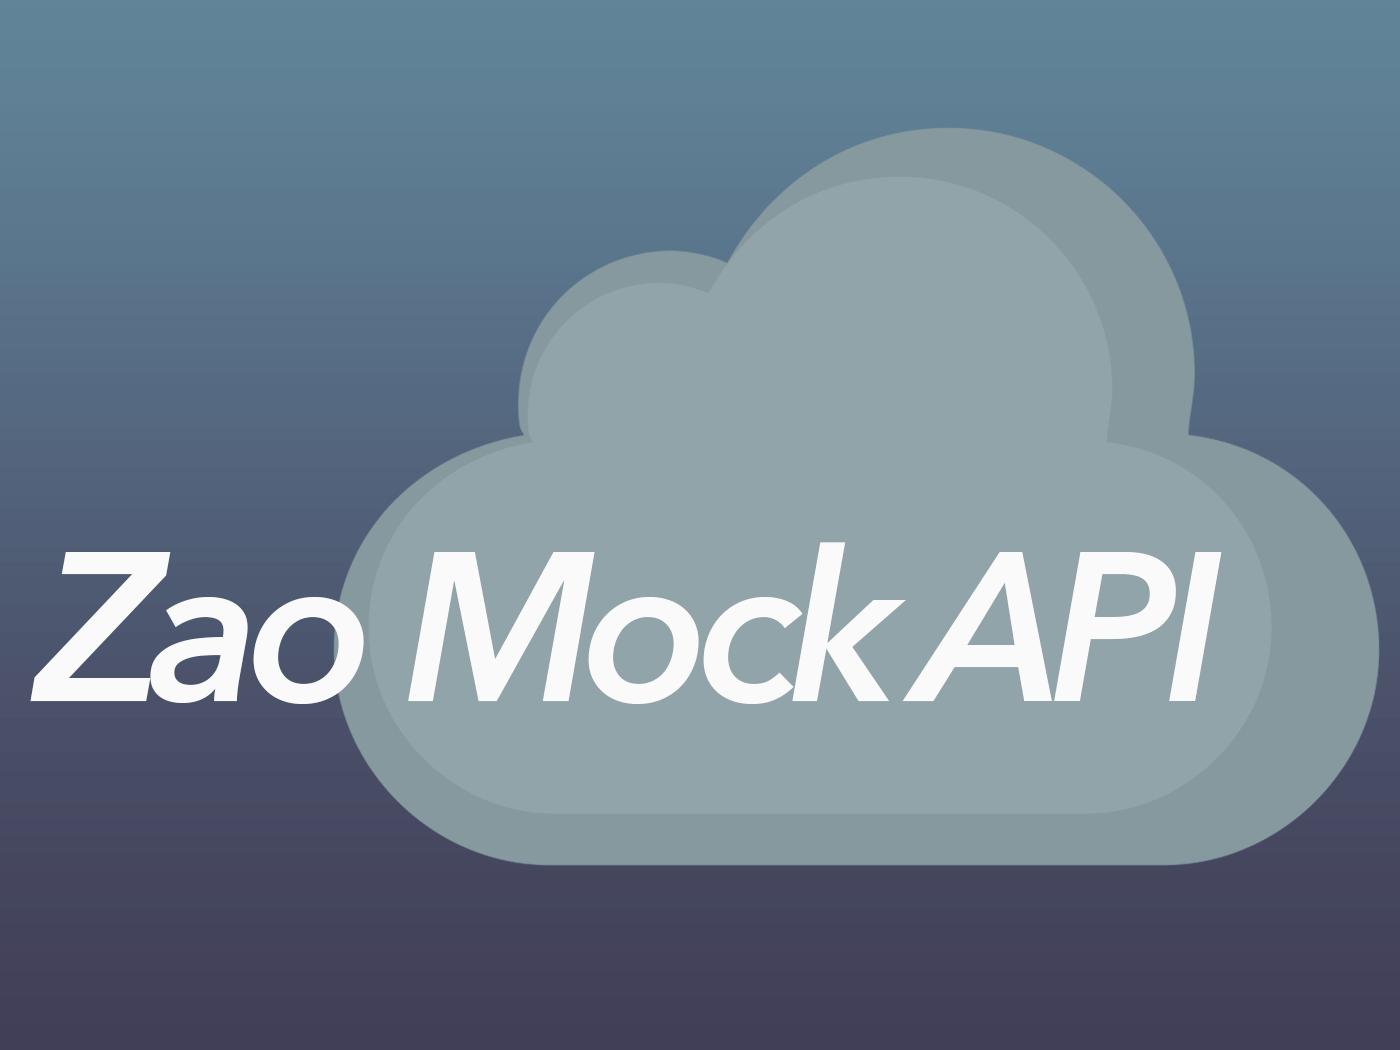 Zao Mock API: A WordPress Plugin for Testing API Responses